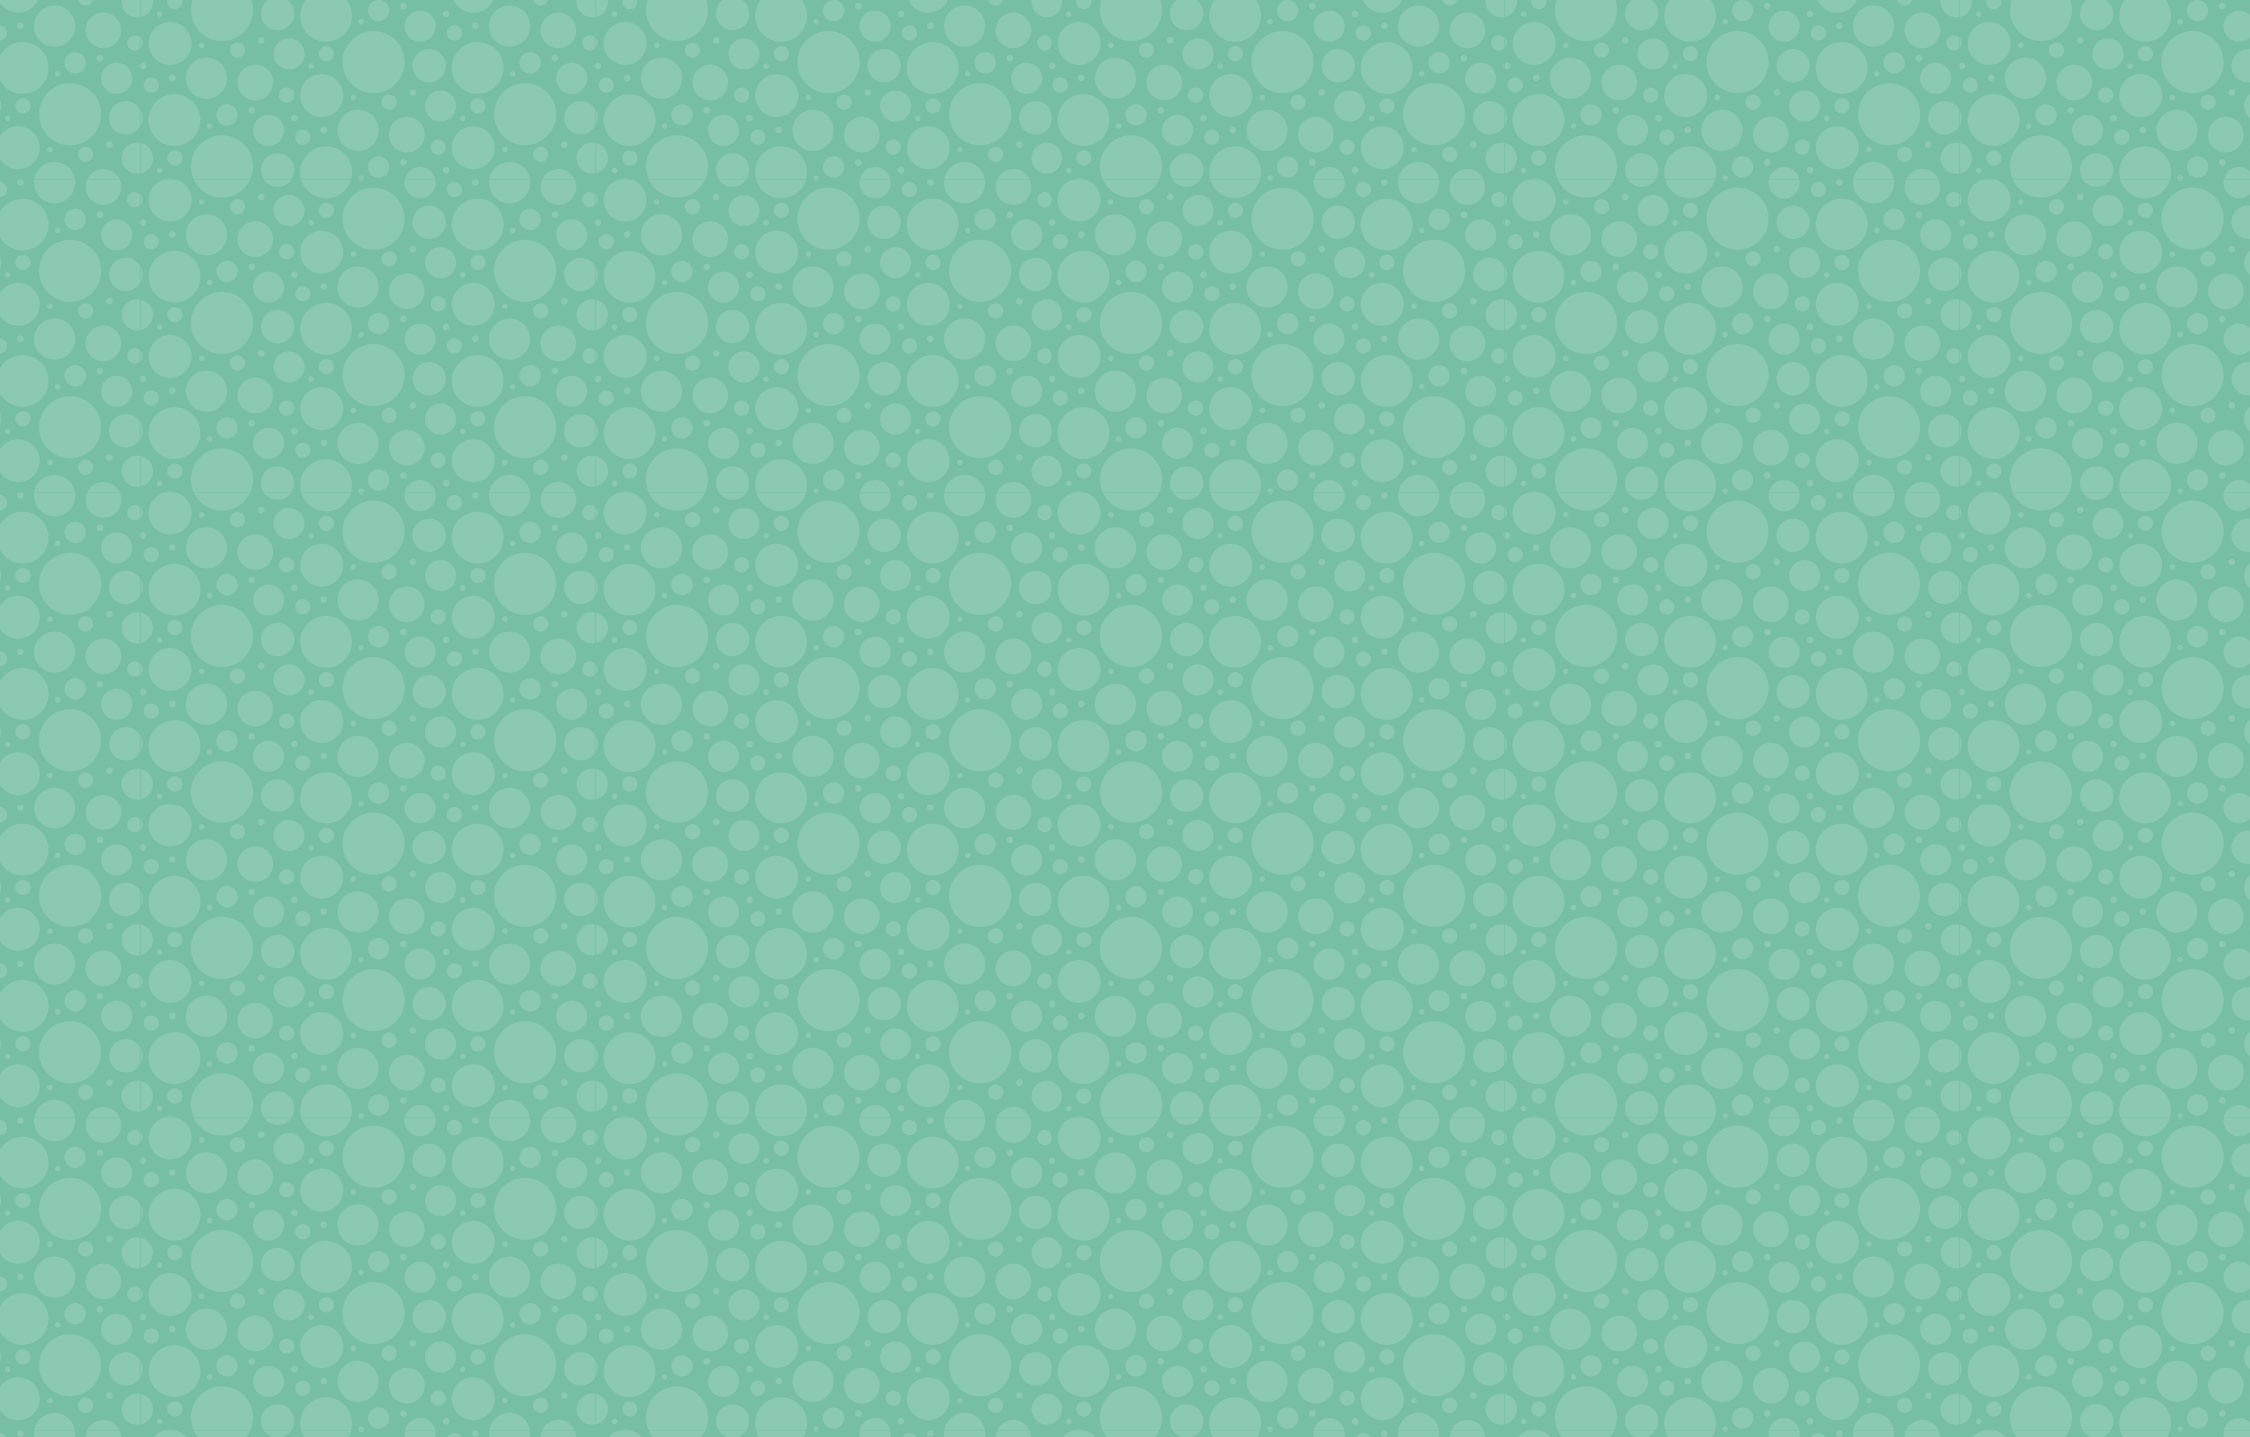 Patterns-2-3.jpg